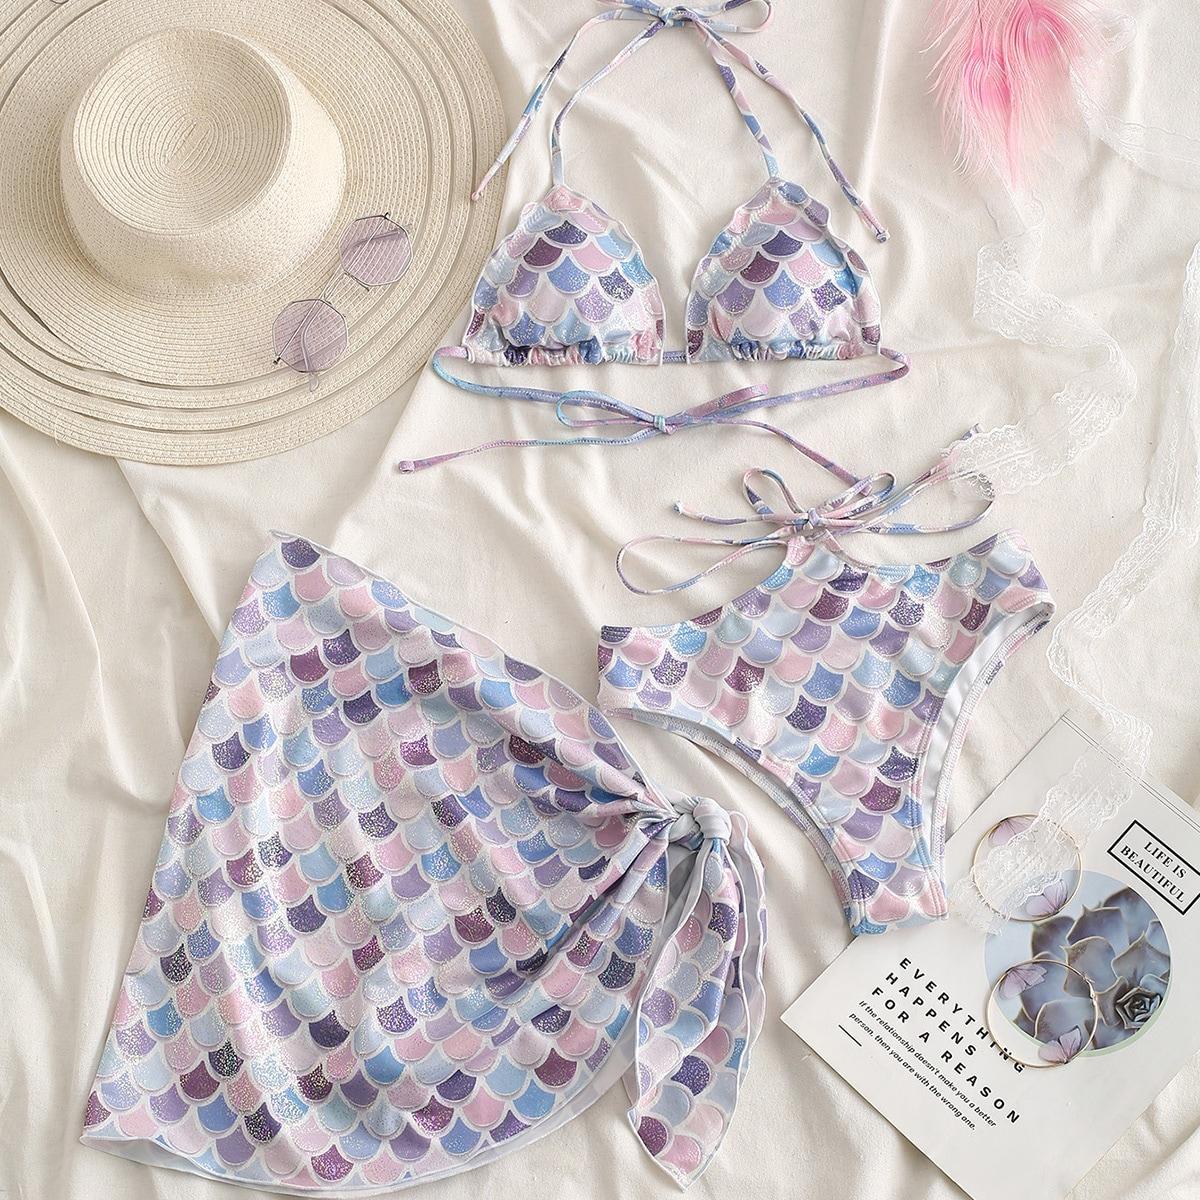 3 пакета бикини и пляжная юбка с чешуевидным узором